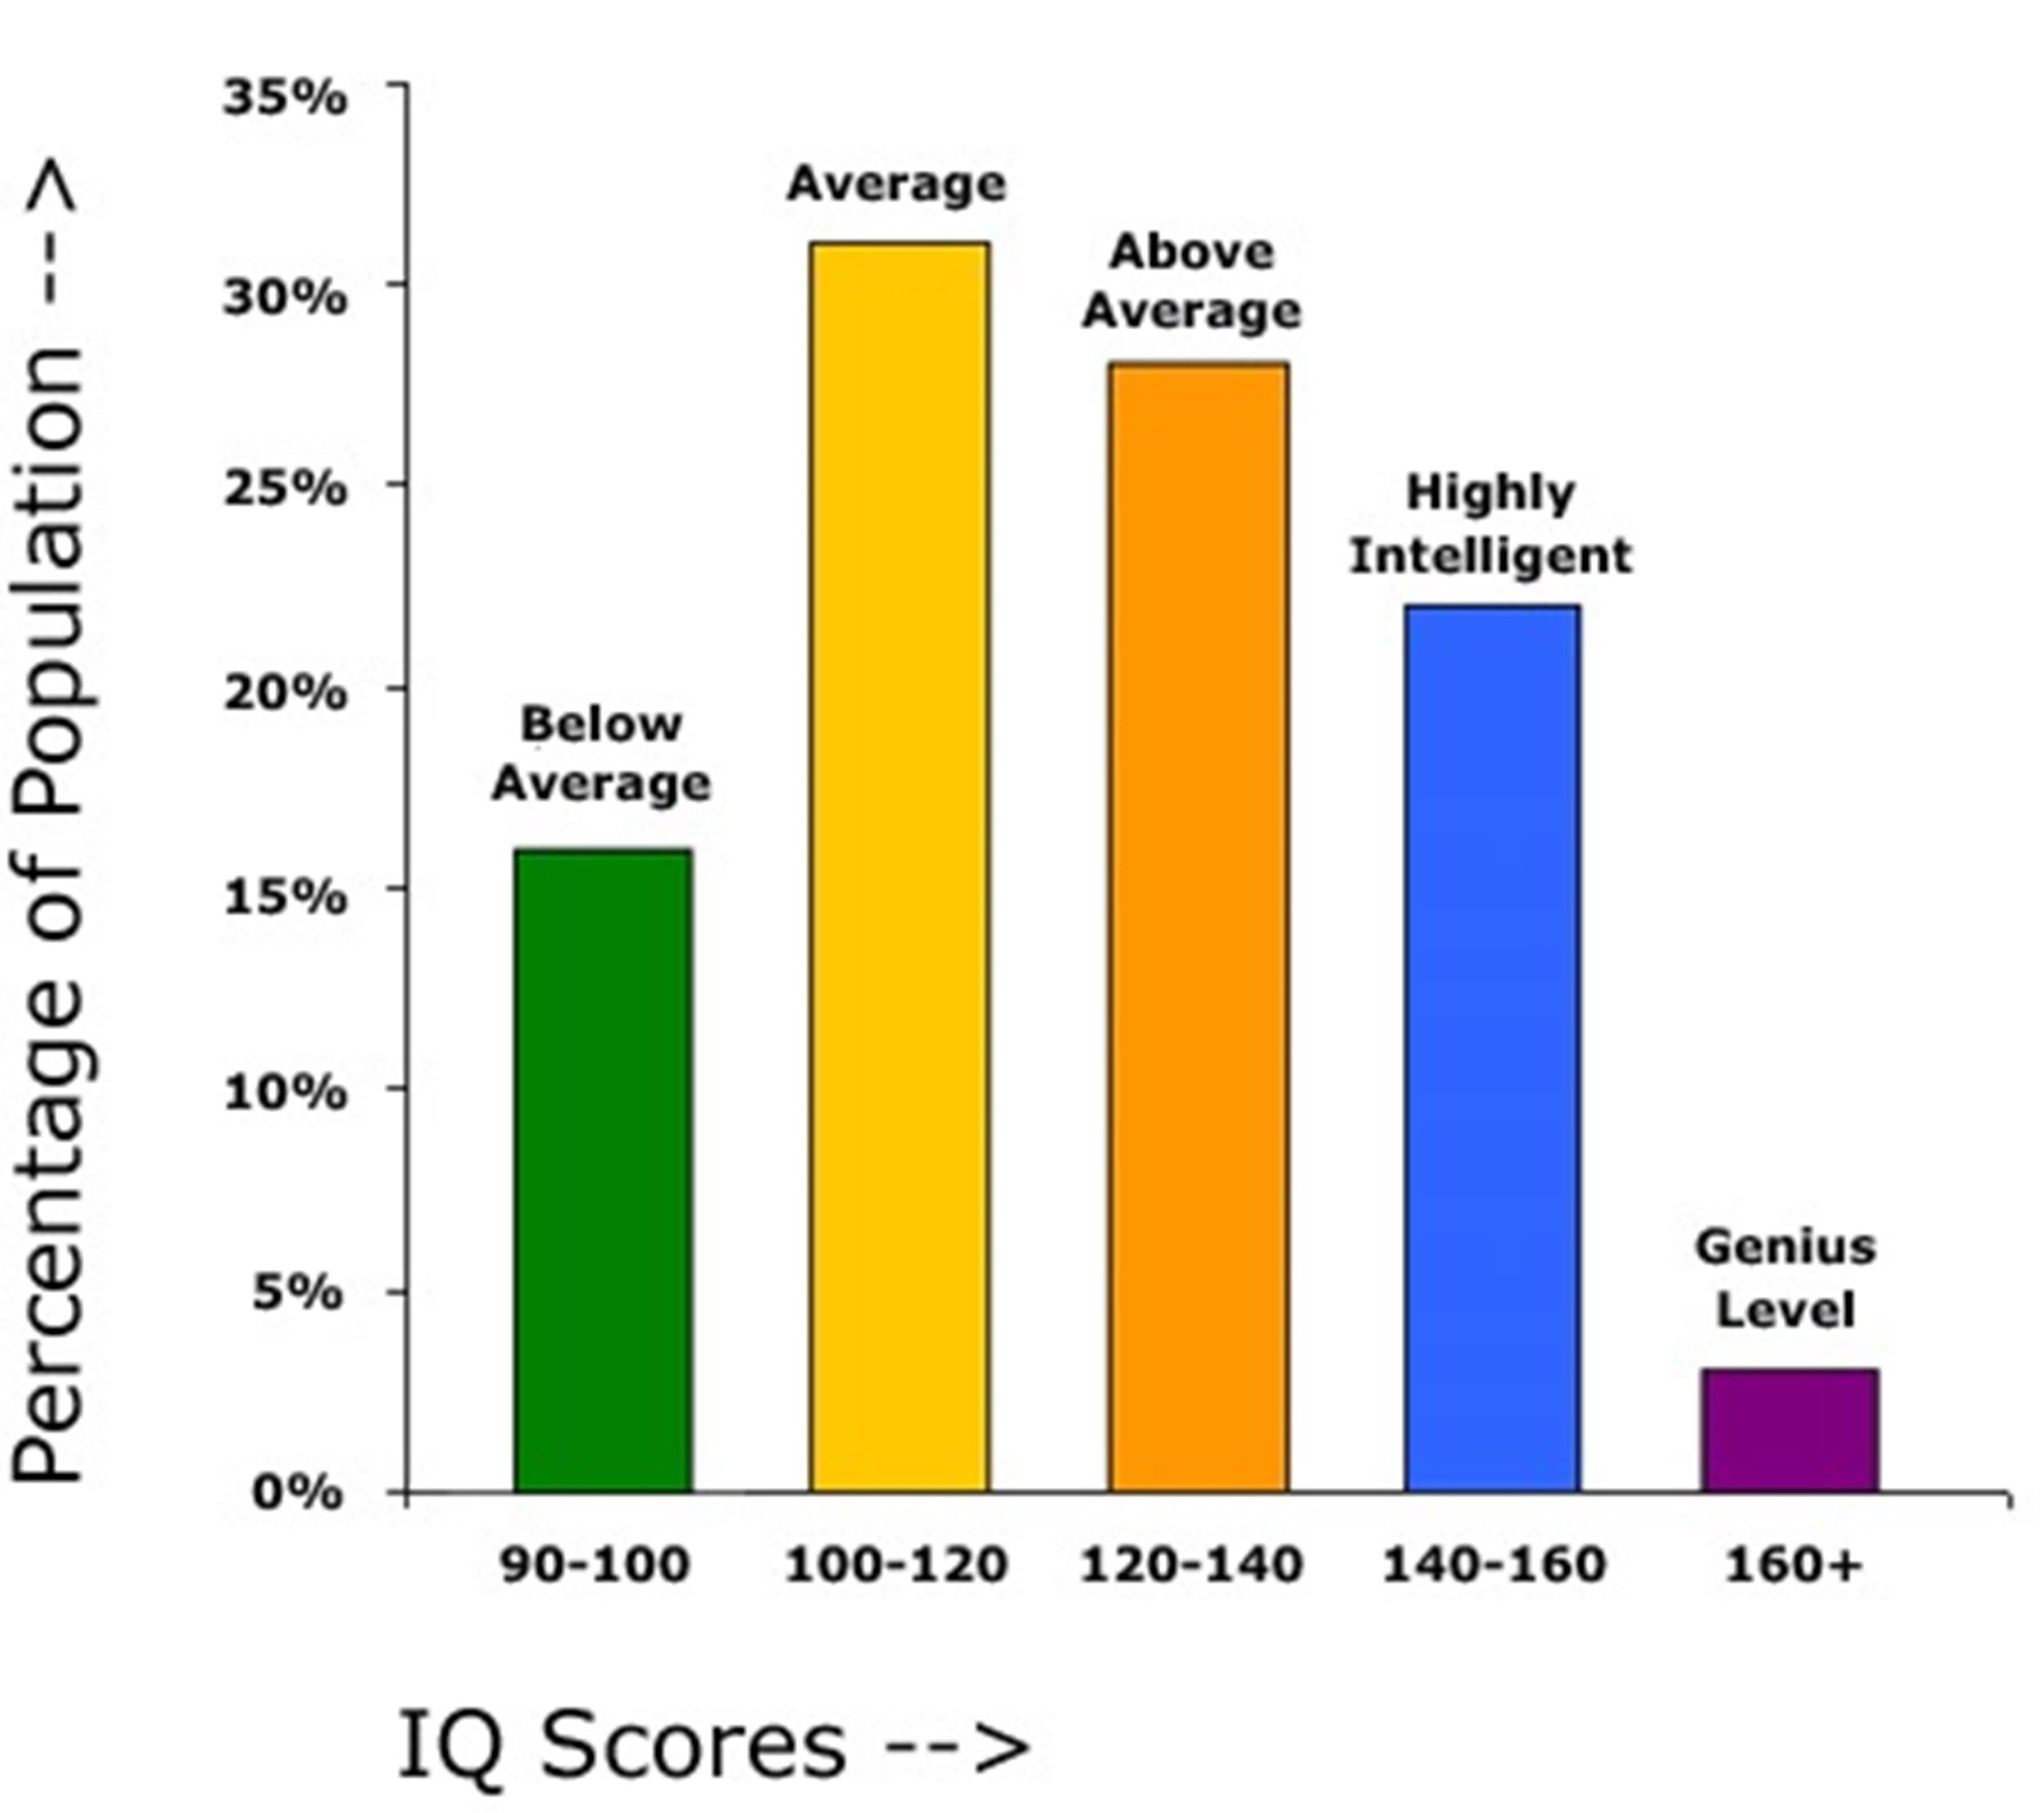 30+ Printable IQ Charts, IQ Scores, IQ Levels - Template Lab - iq chart template